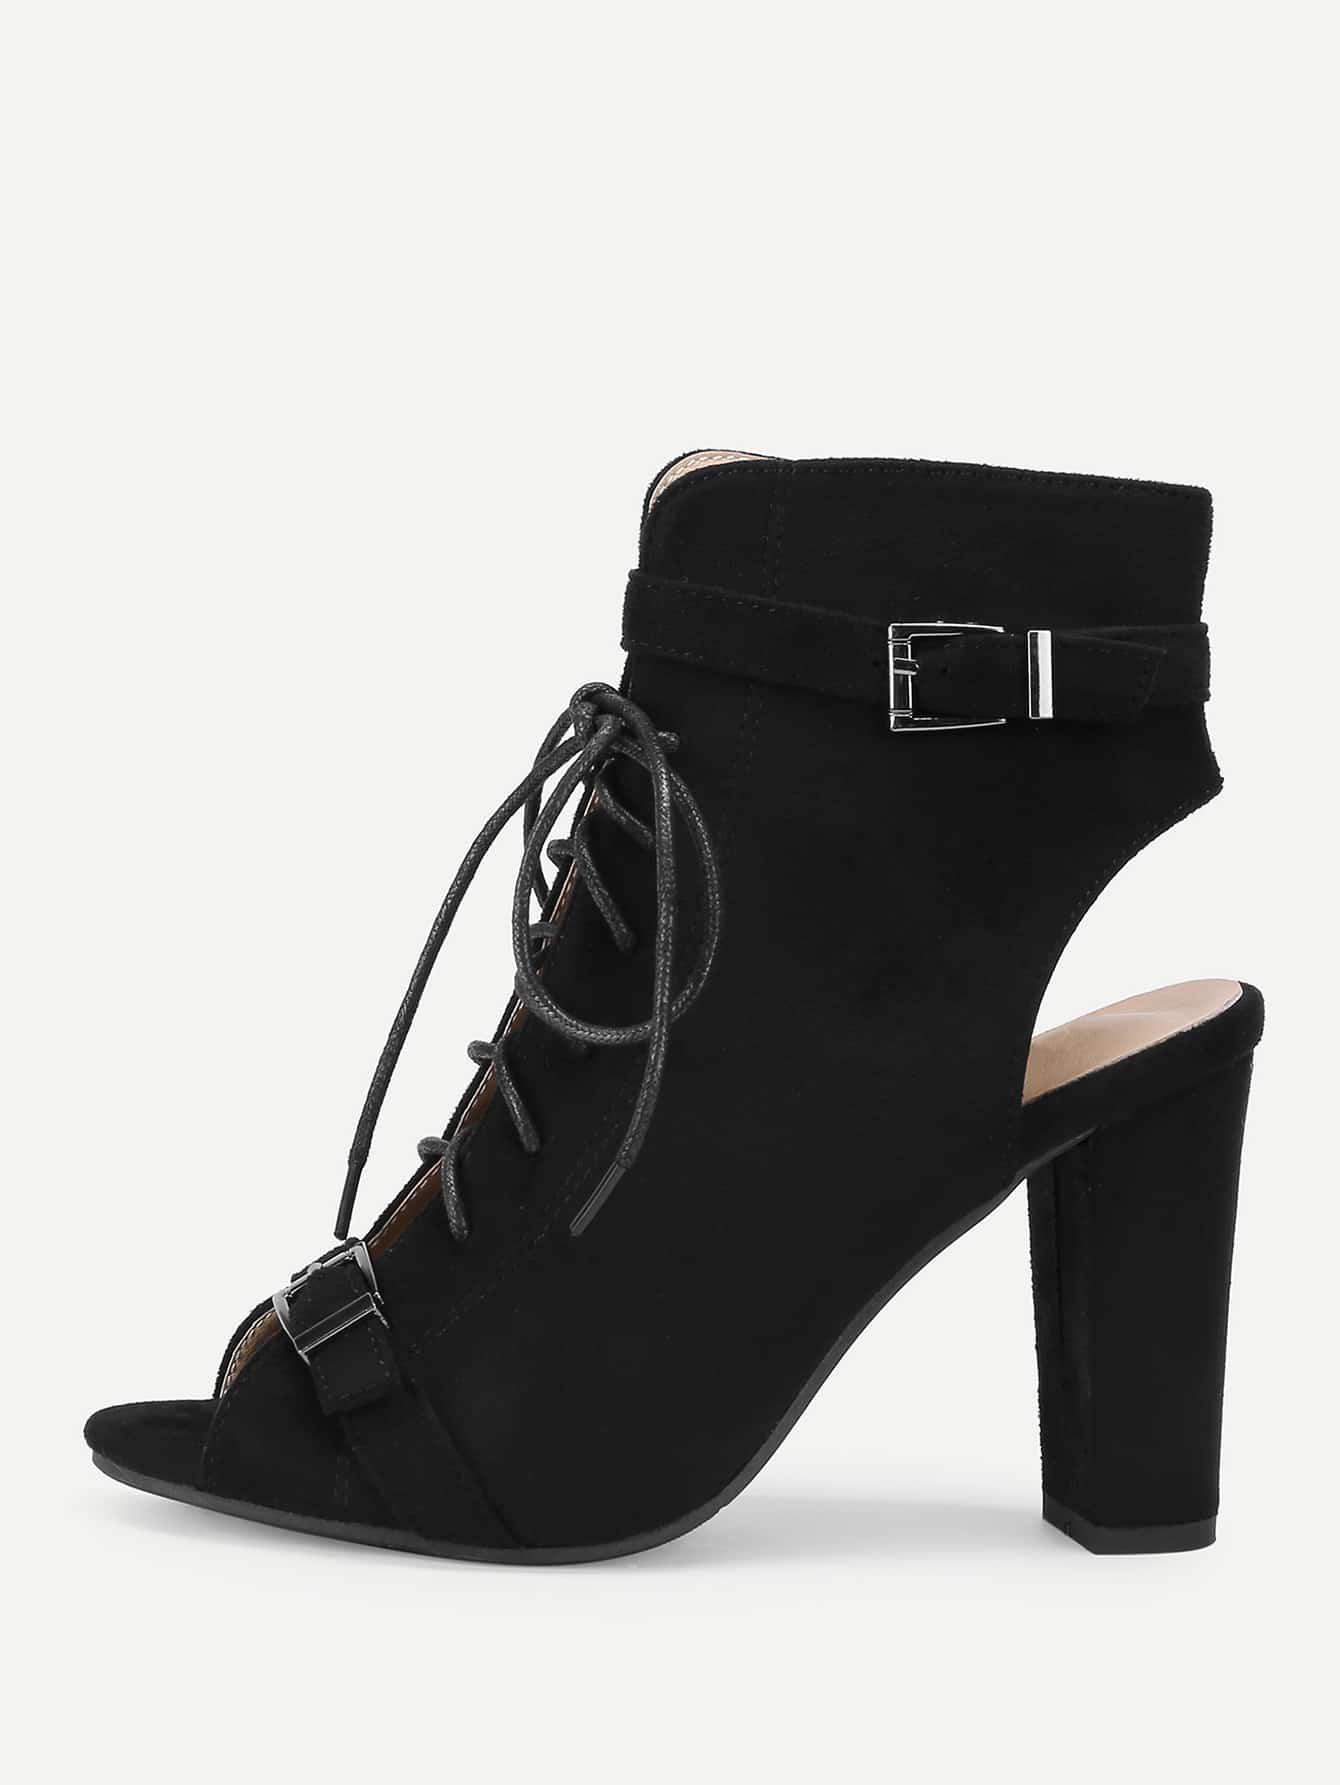 Peep Toe Lace Up High Heels shoes171227811